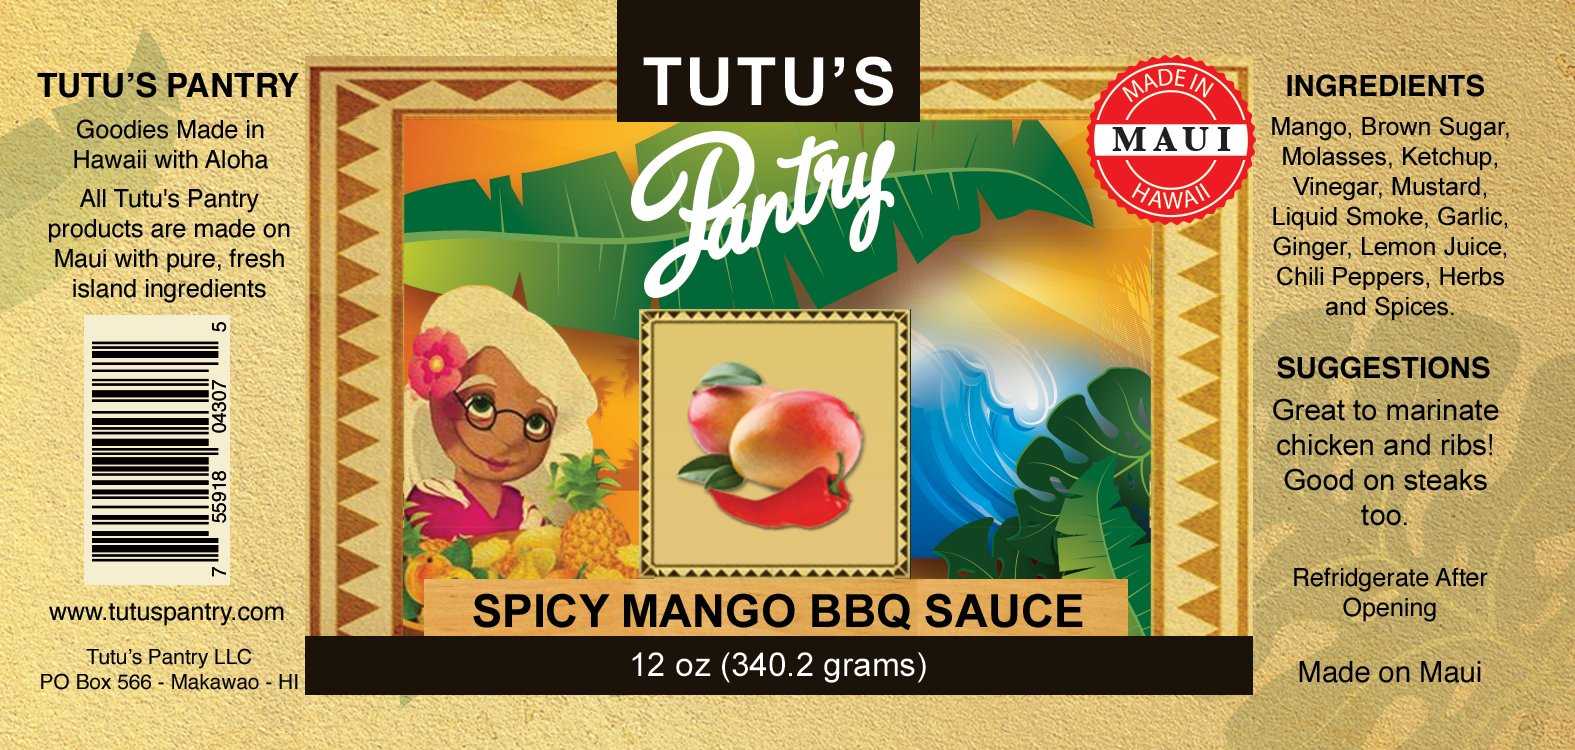 spicy mango bbq label